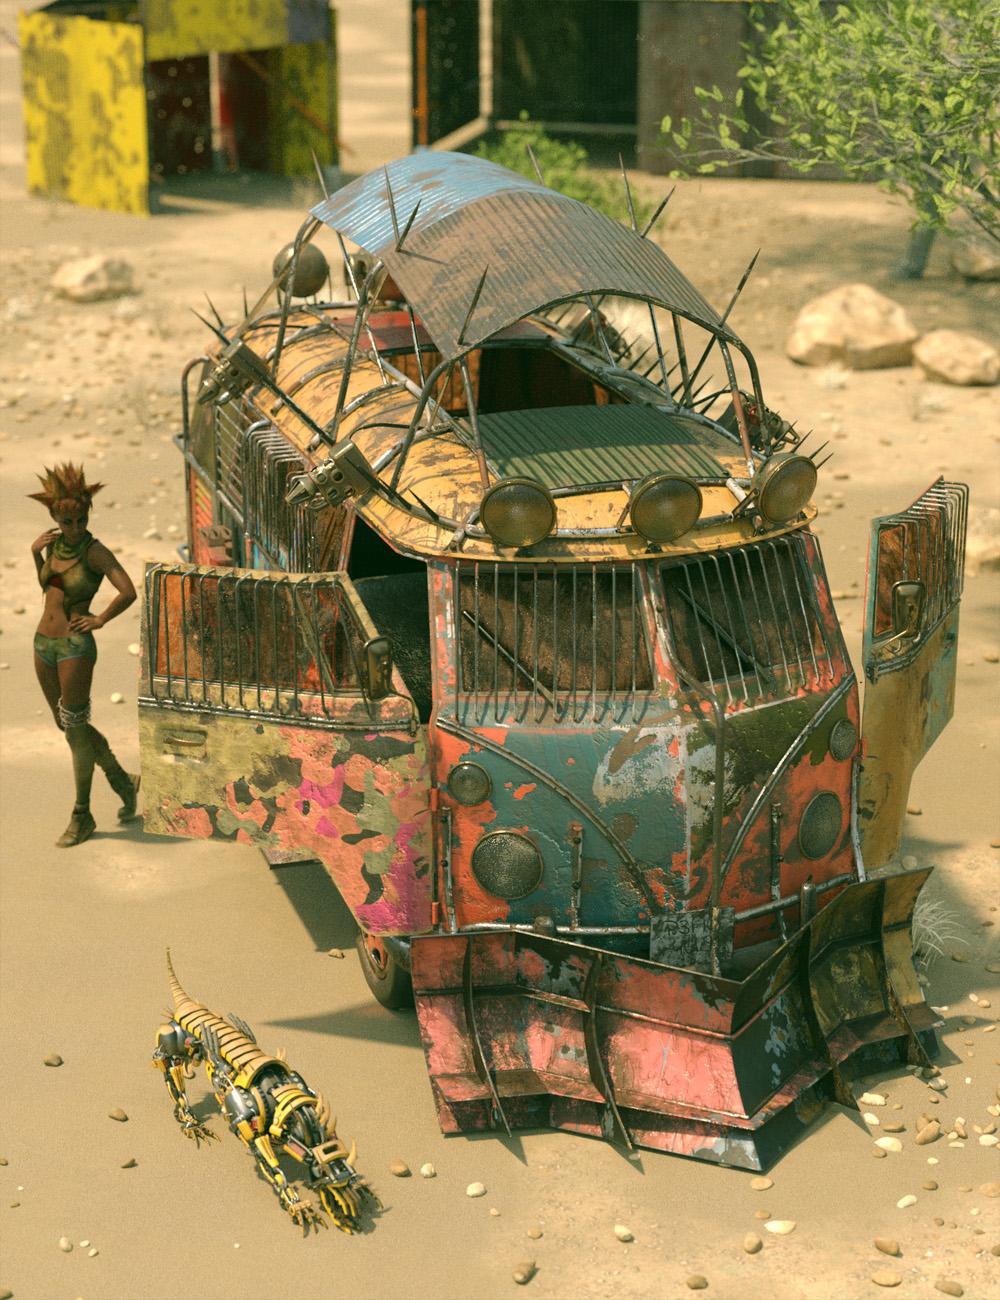 Retro Camper Van Apocalypse Add-On by: ForbiddenWhispersDavid Brinnen, 3D Models by Daz 3D